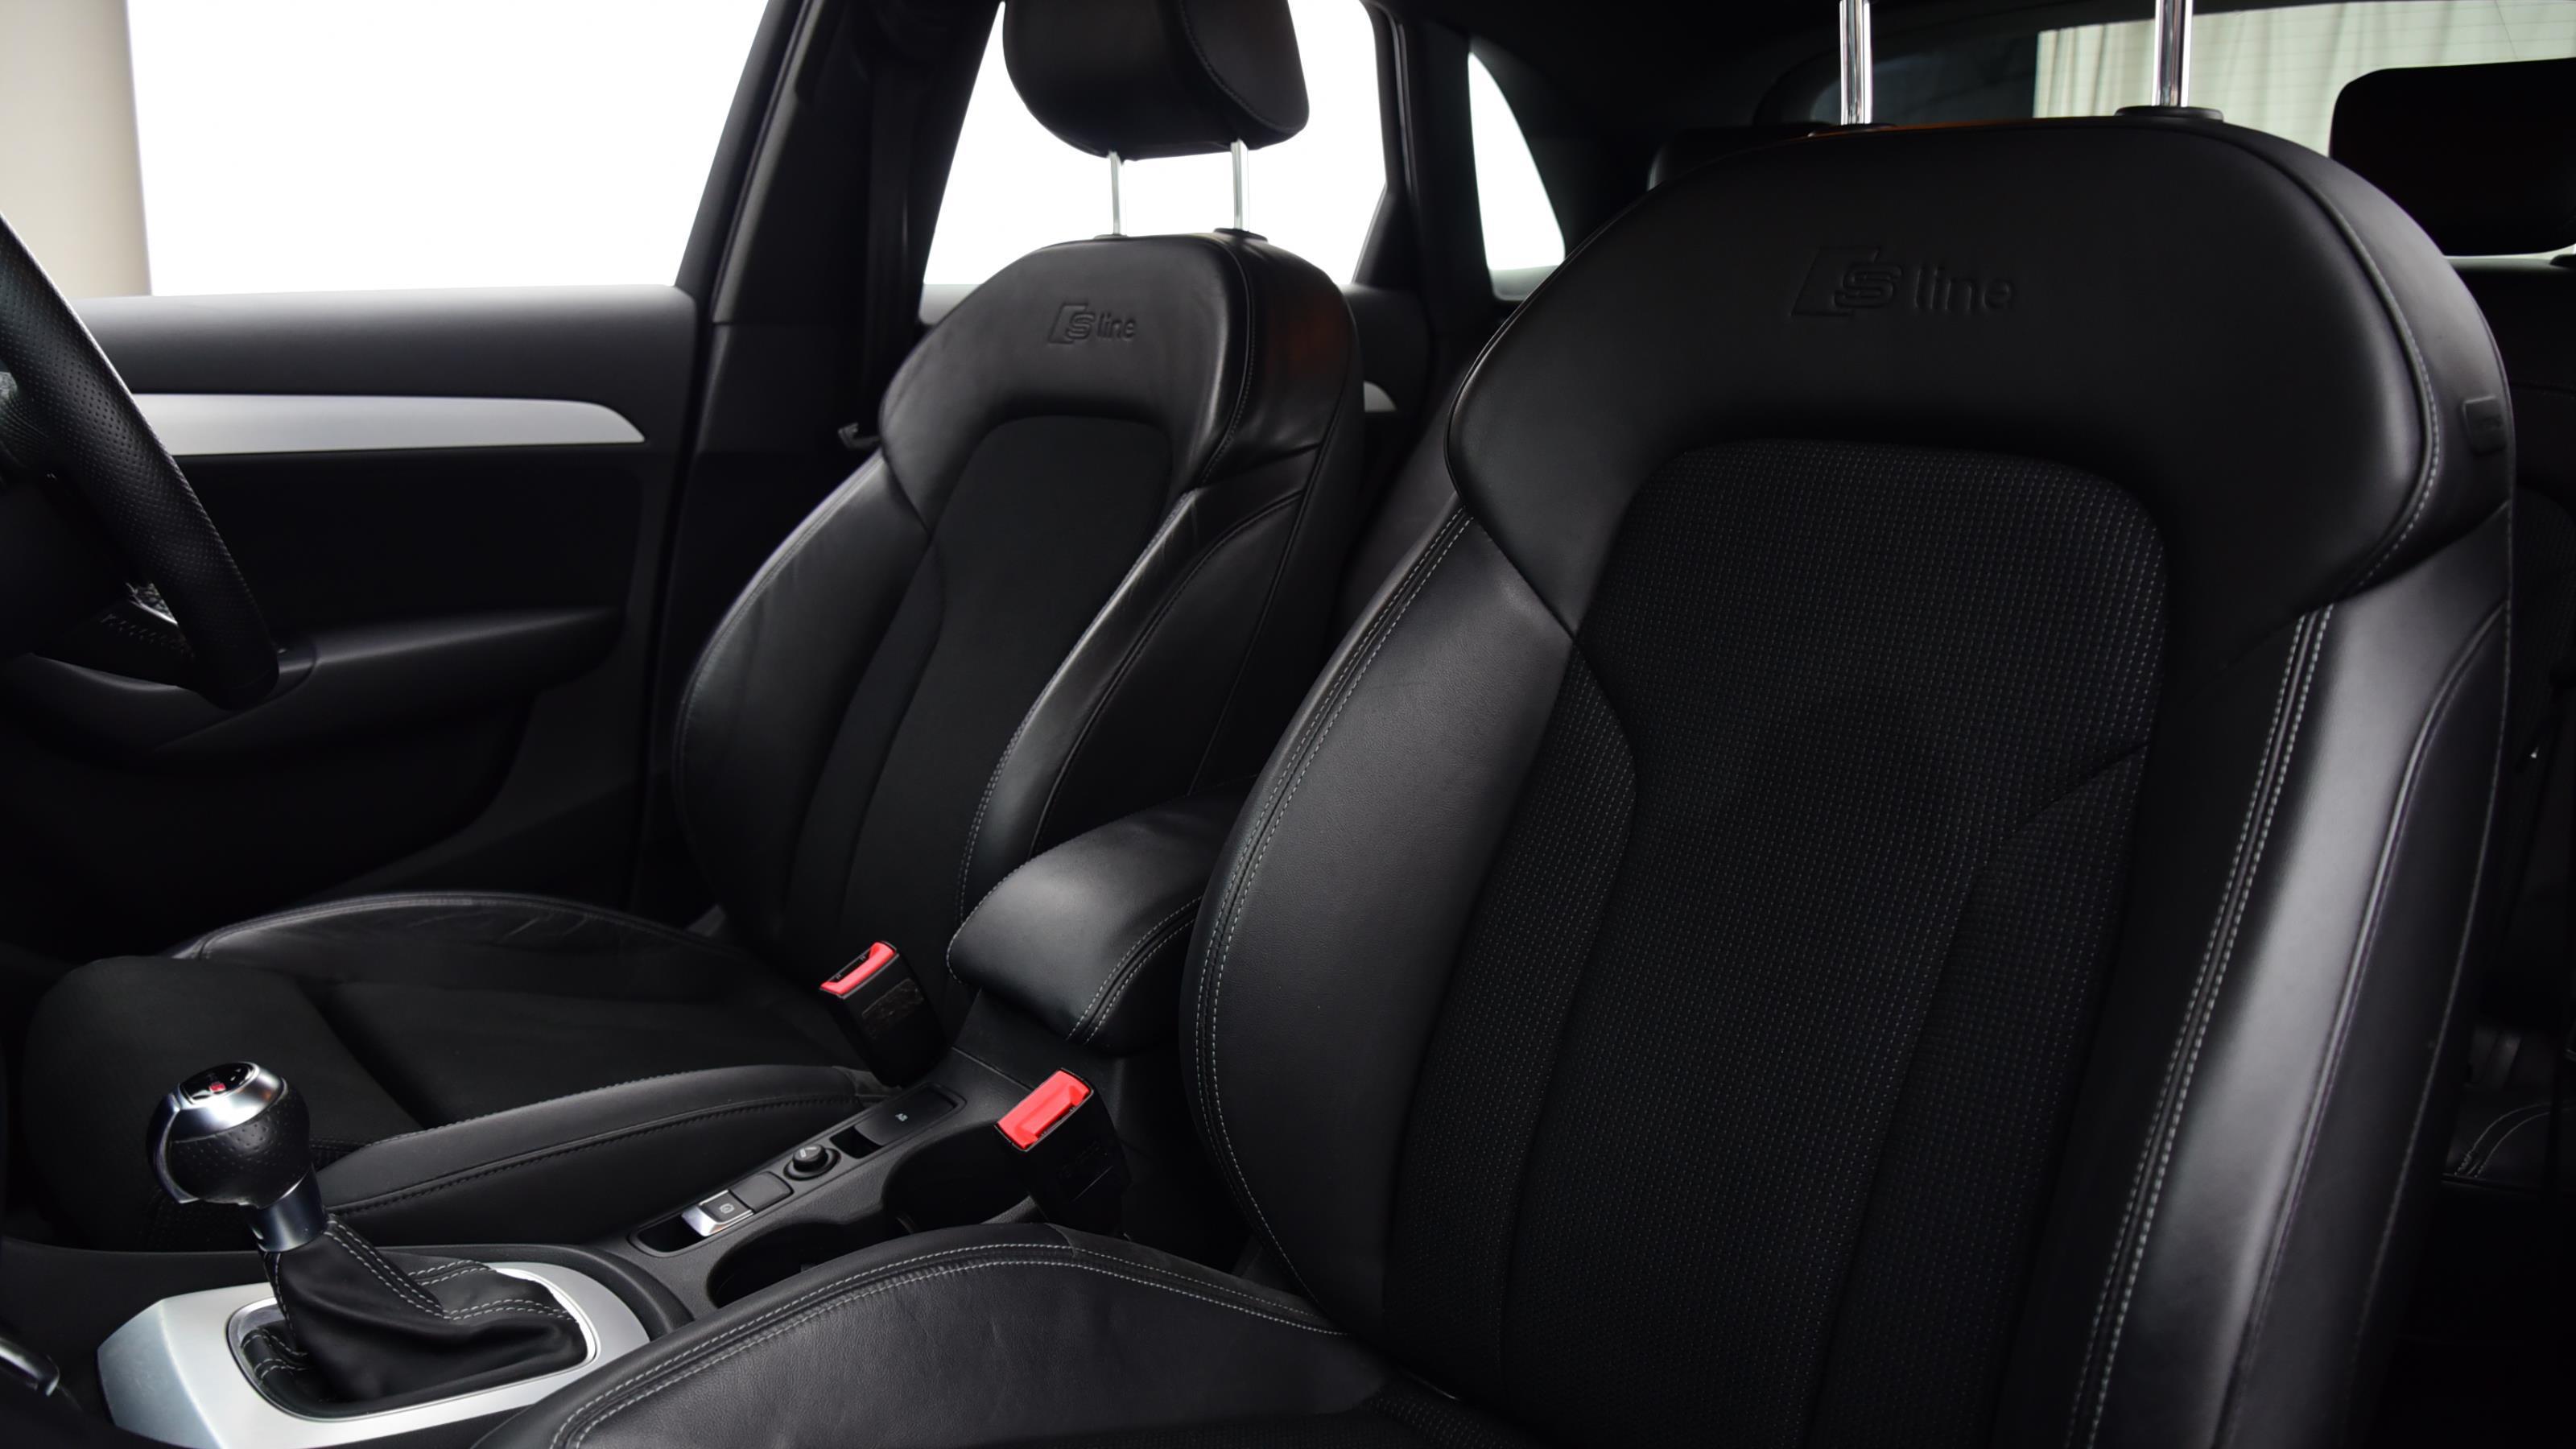 Used 14 Audi Q3 2.0 TDI [177] Quattro S Line 5dr S Tronic BROWN at Saxton4x4